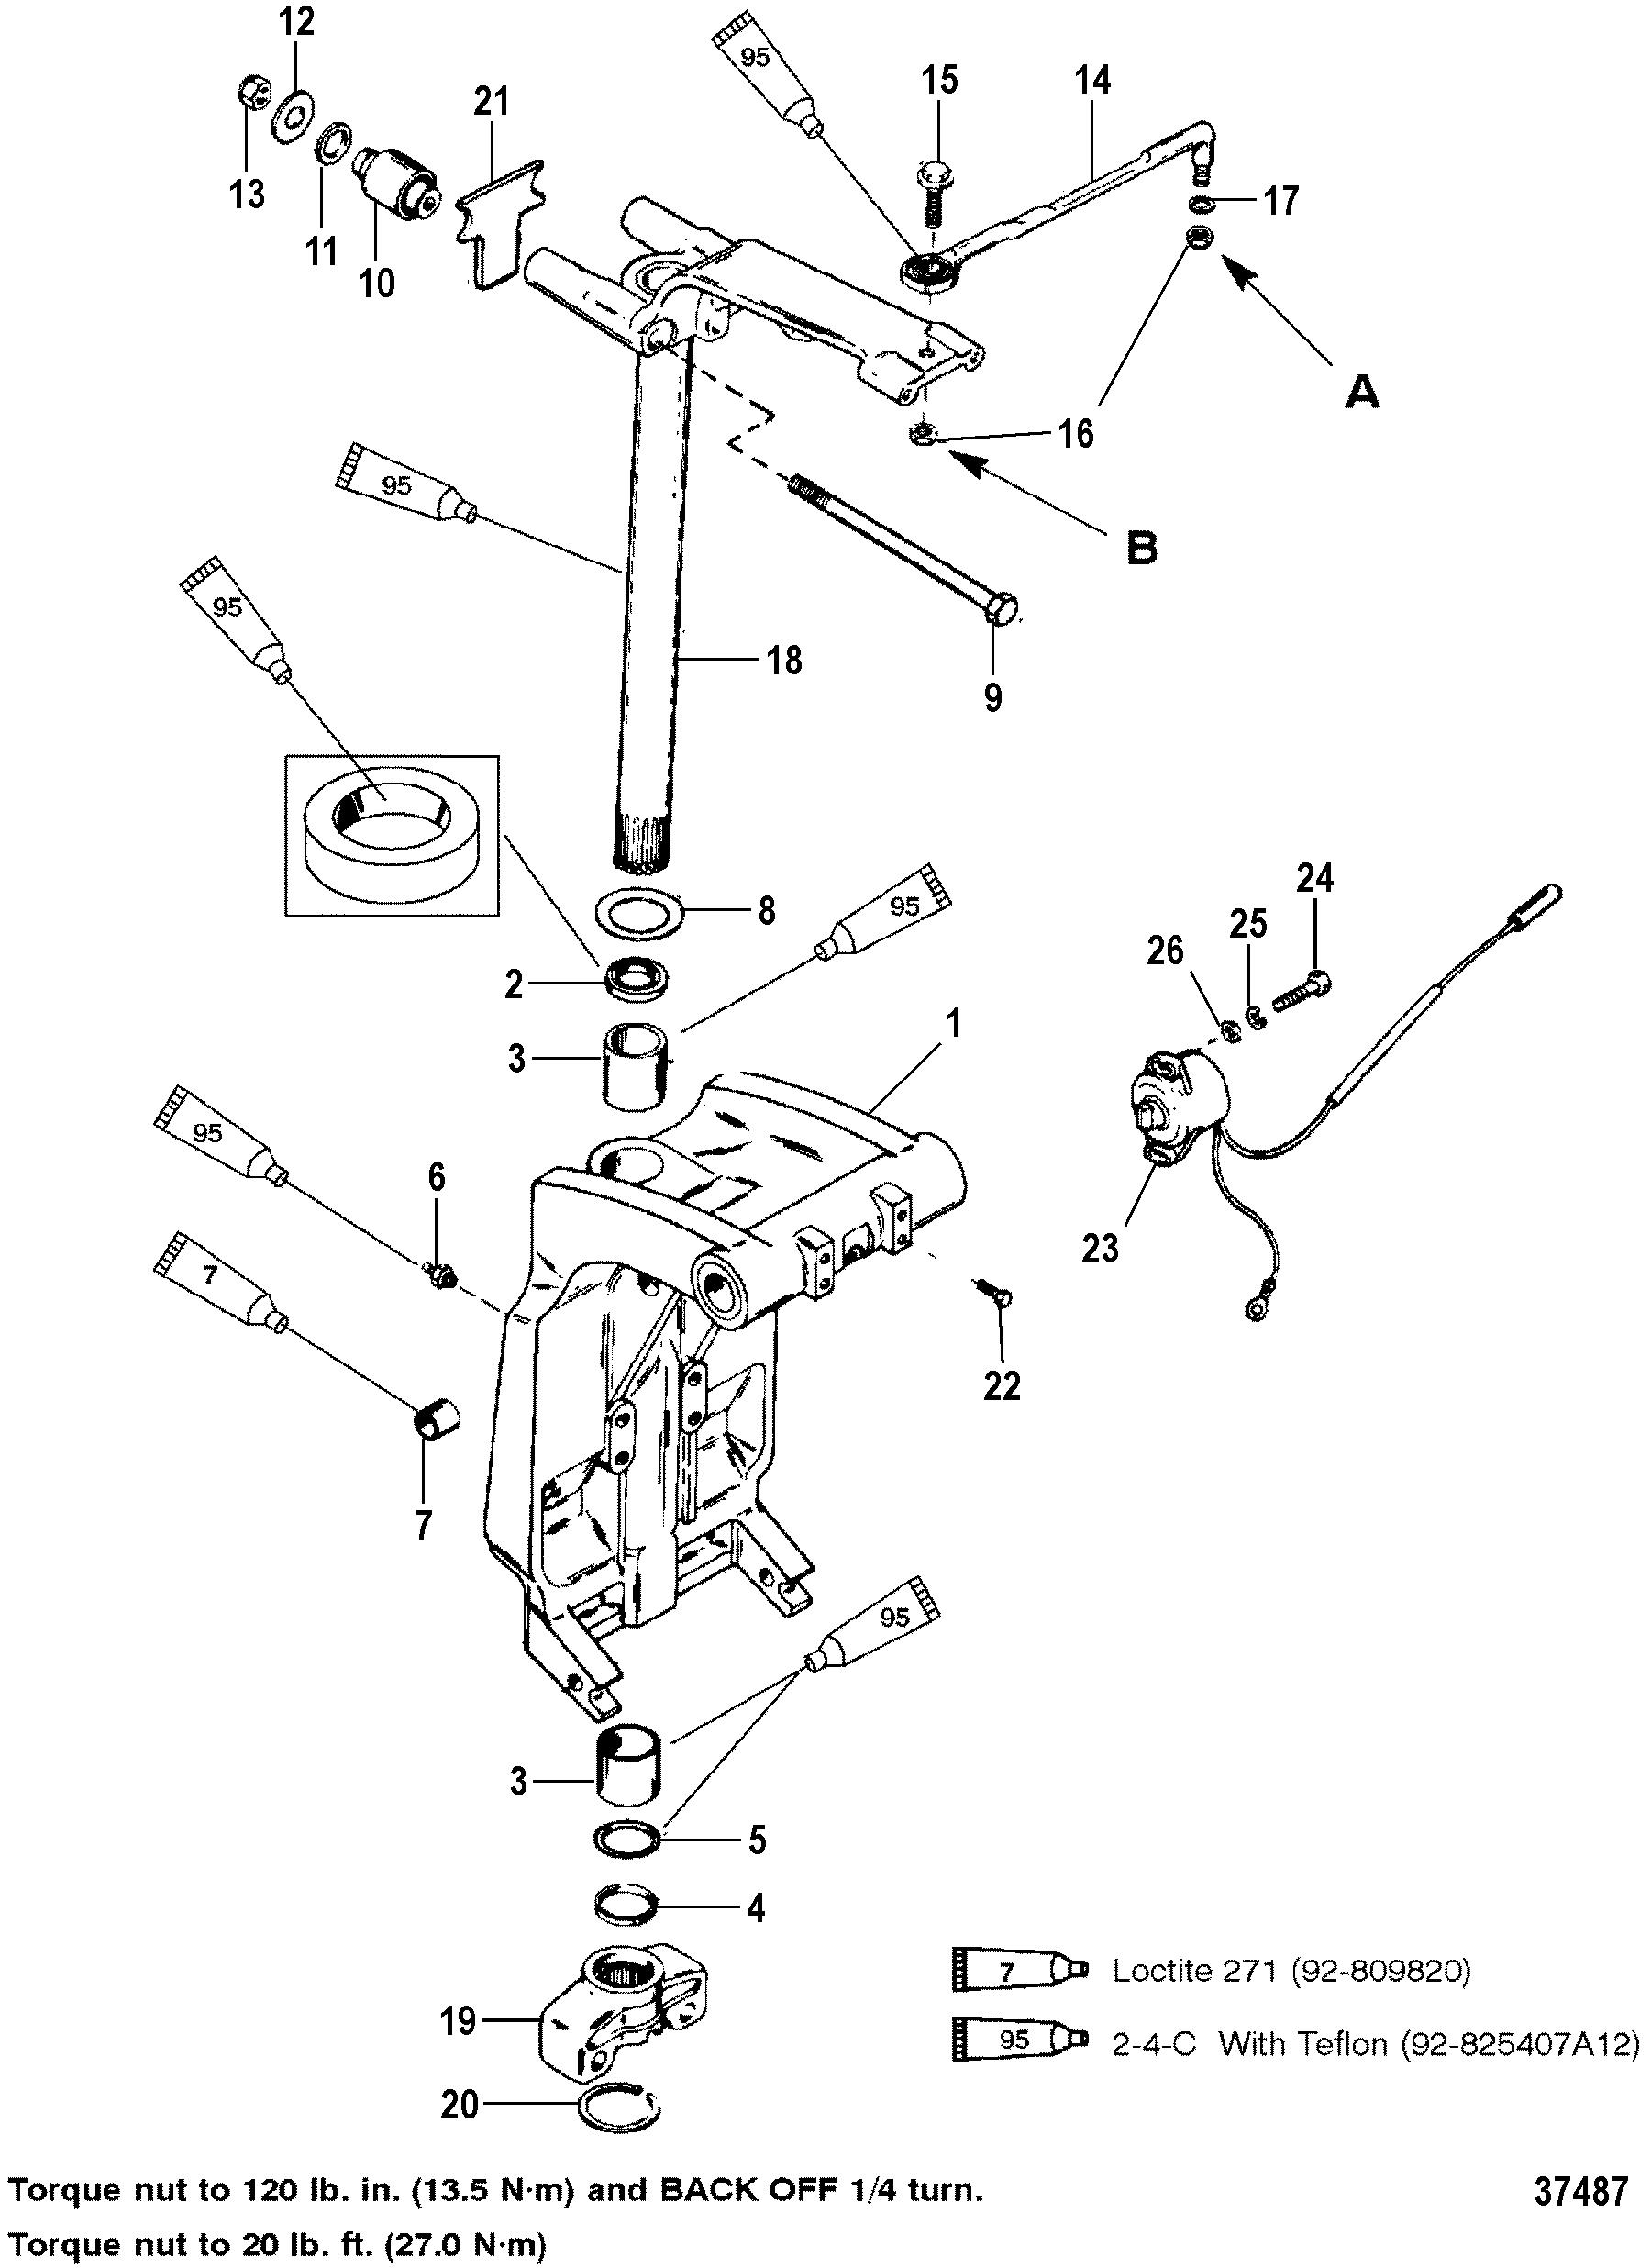 2000 Mercury Mariner Parts Diagrams Trusted Wiring Diagram Outboard Motor Steering Download U2022 Catalog